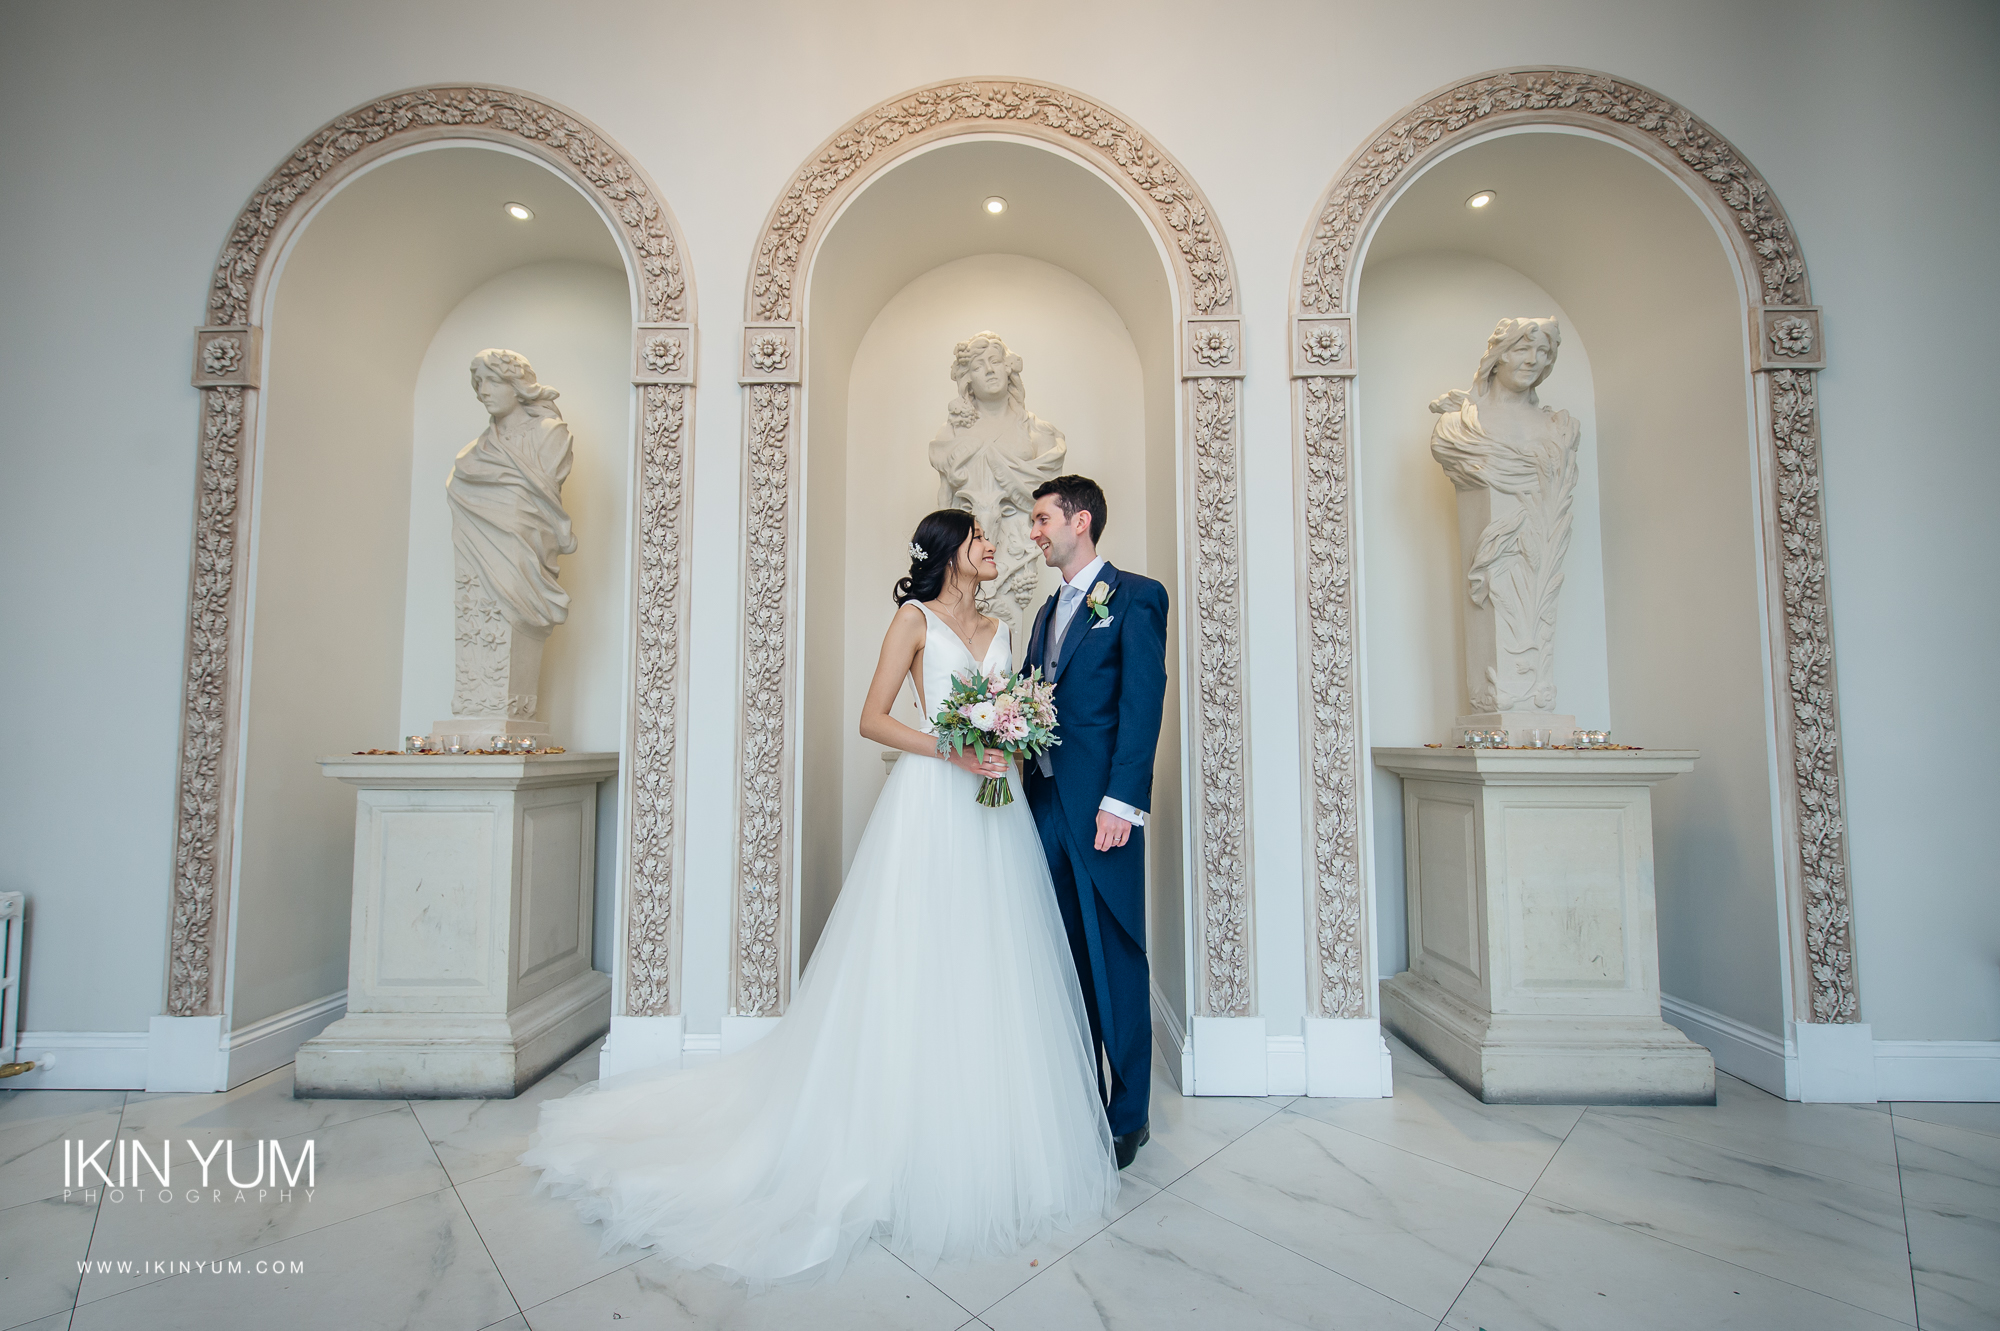 Froyle Park Wedding - Chinese Wedding Photographer -  英国伦敦 婚礼 摄影